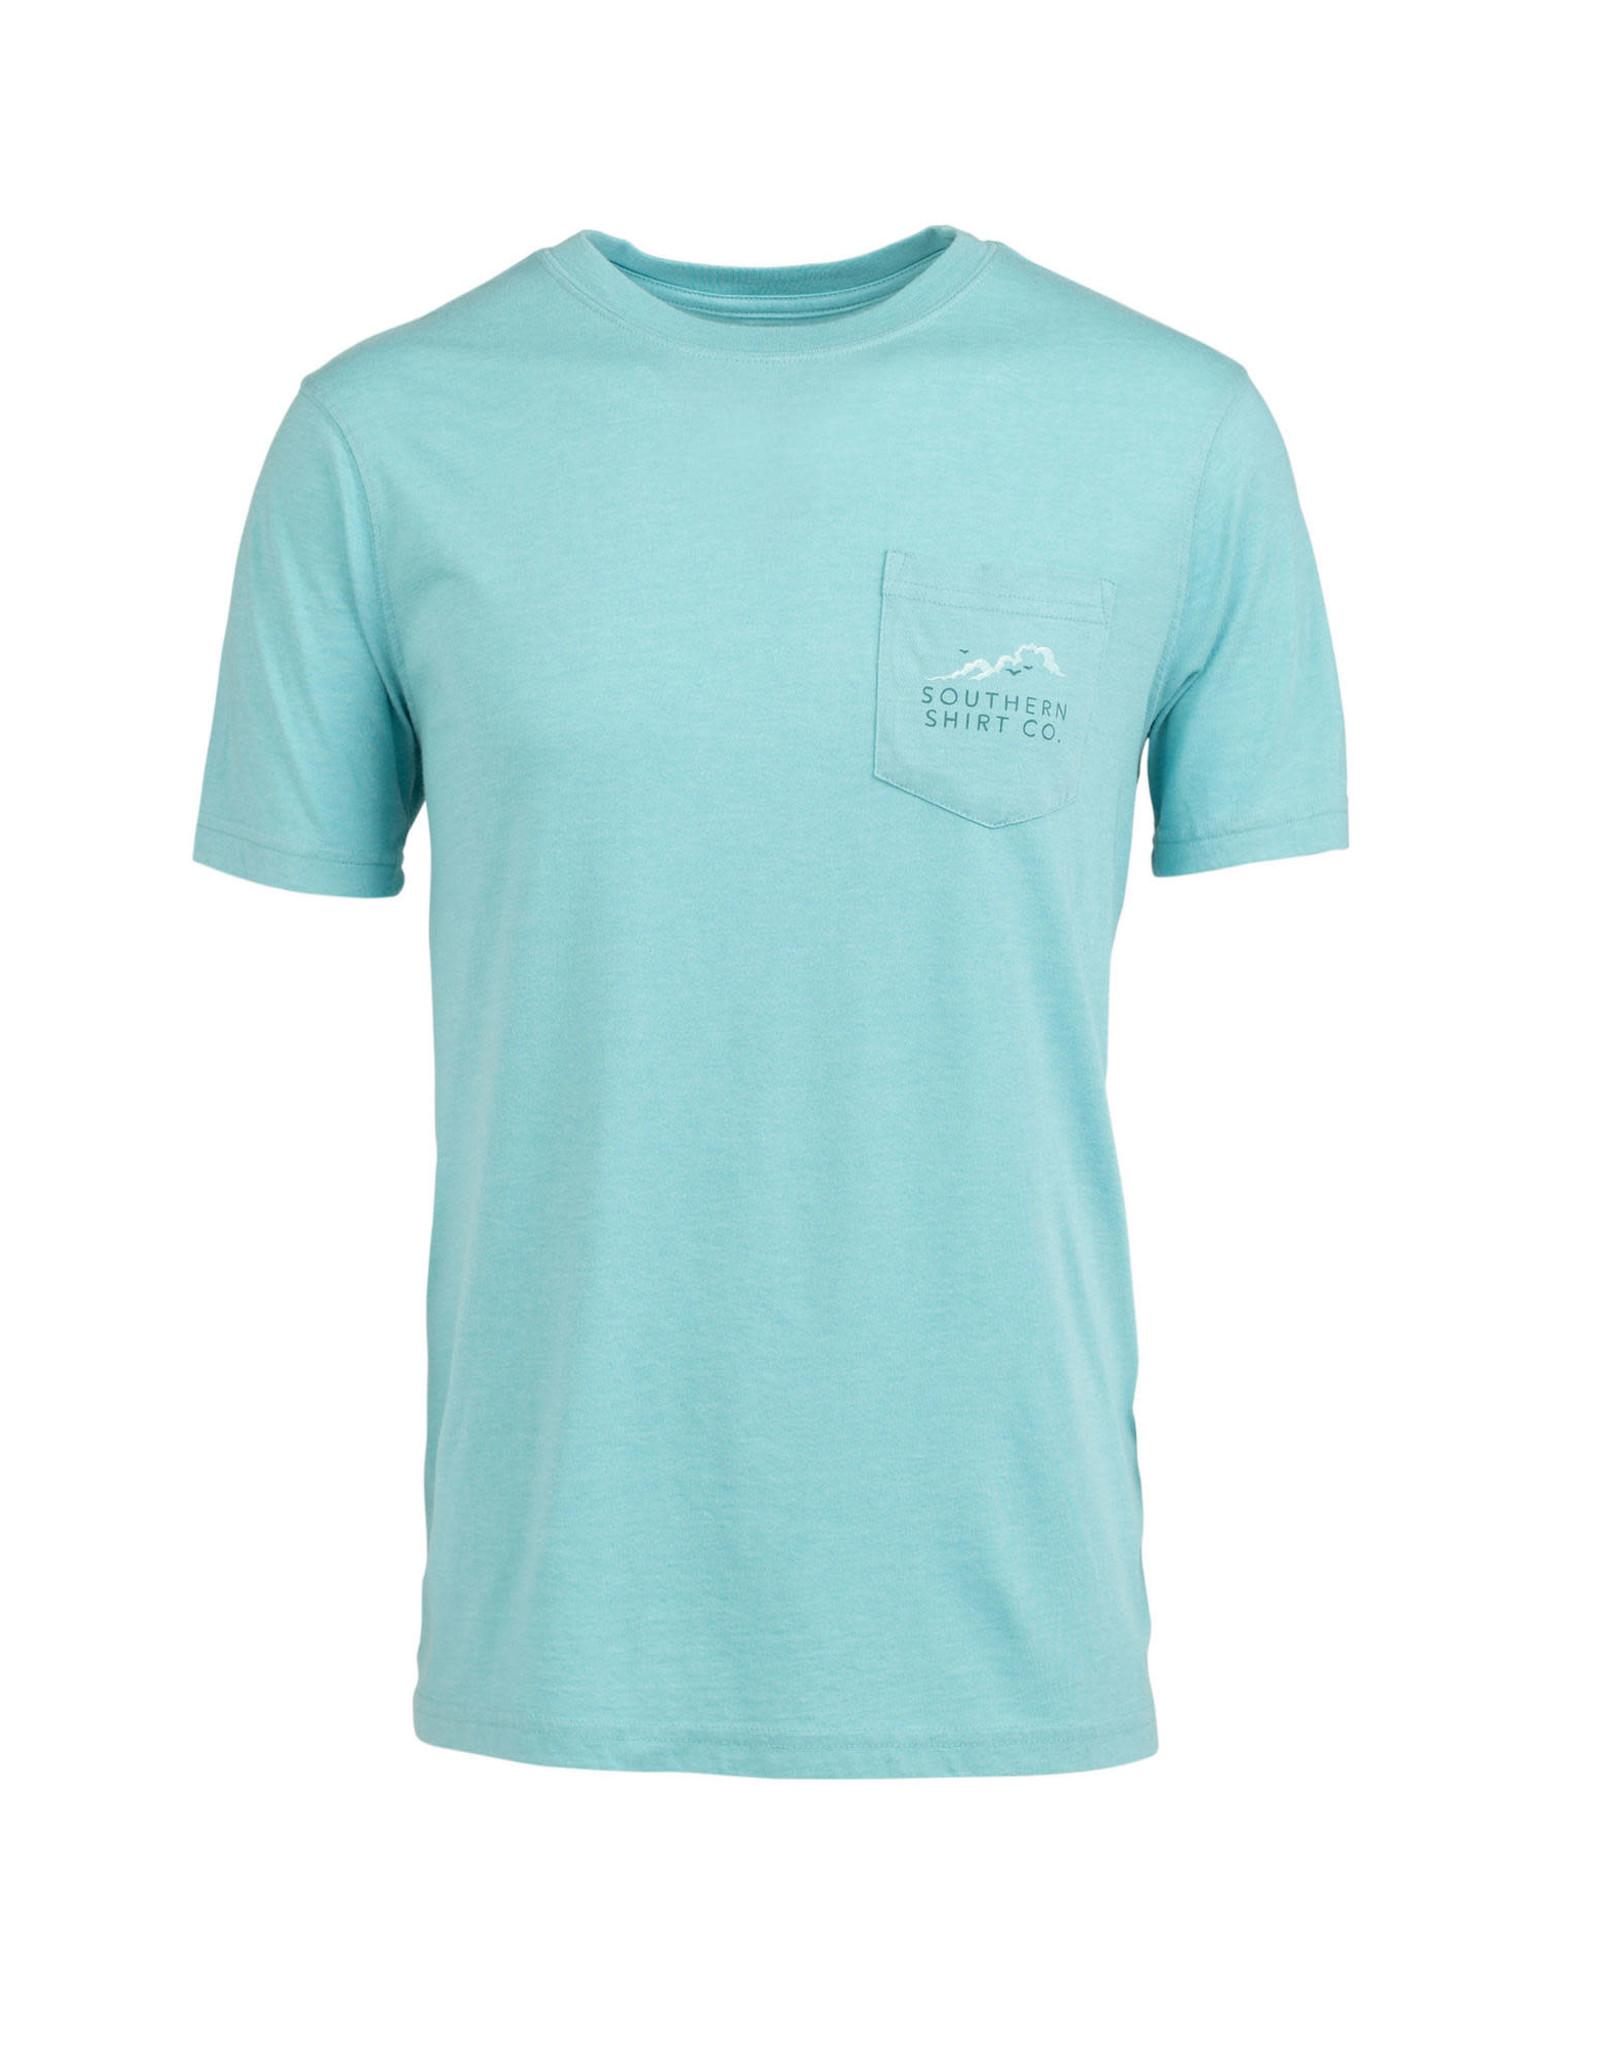 Southern Shirt Co 1T120 - Summer Swells SS Tee